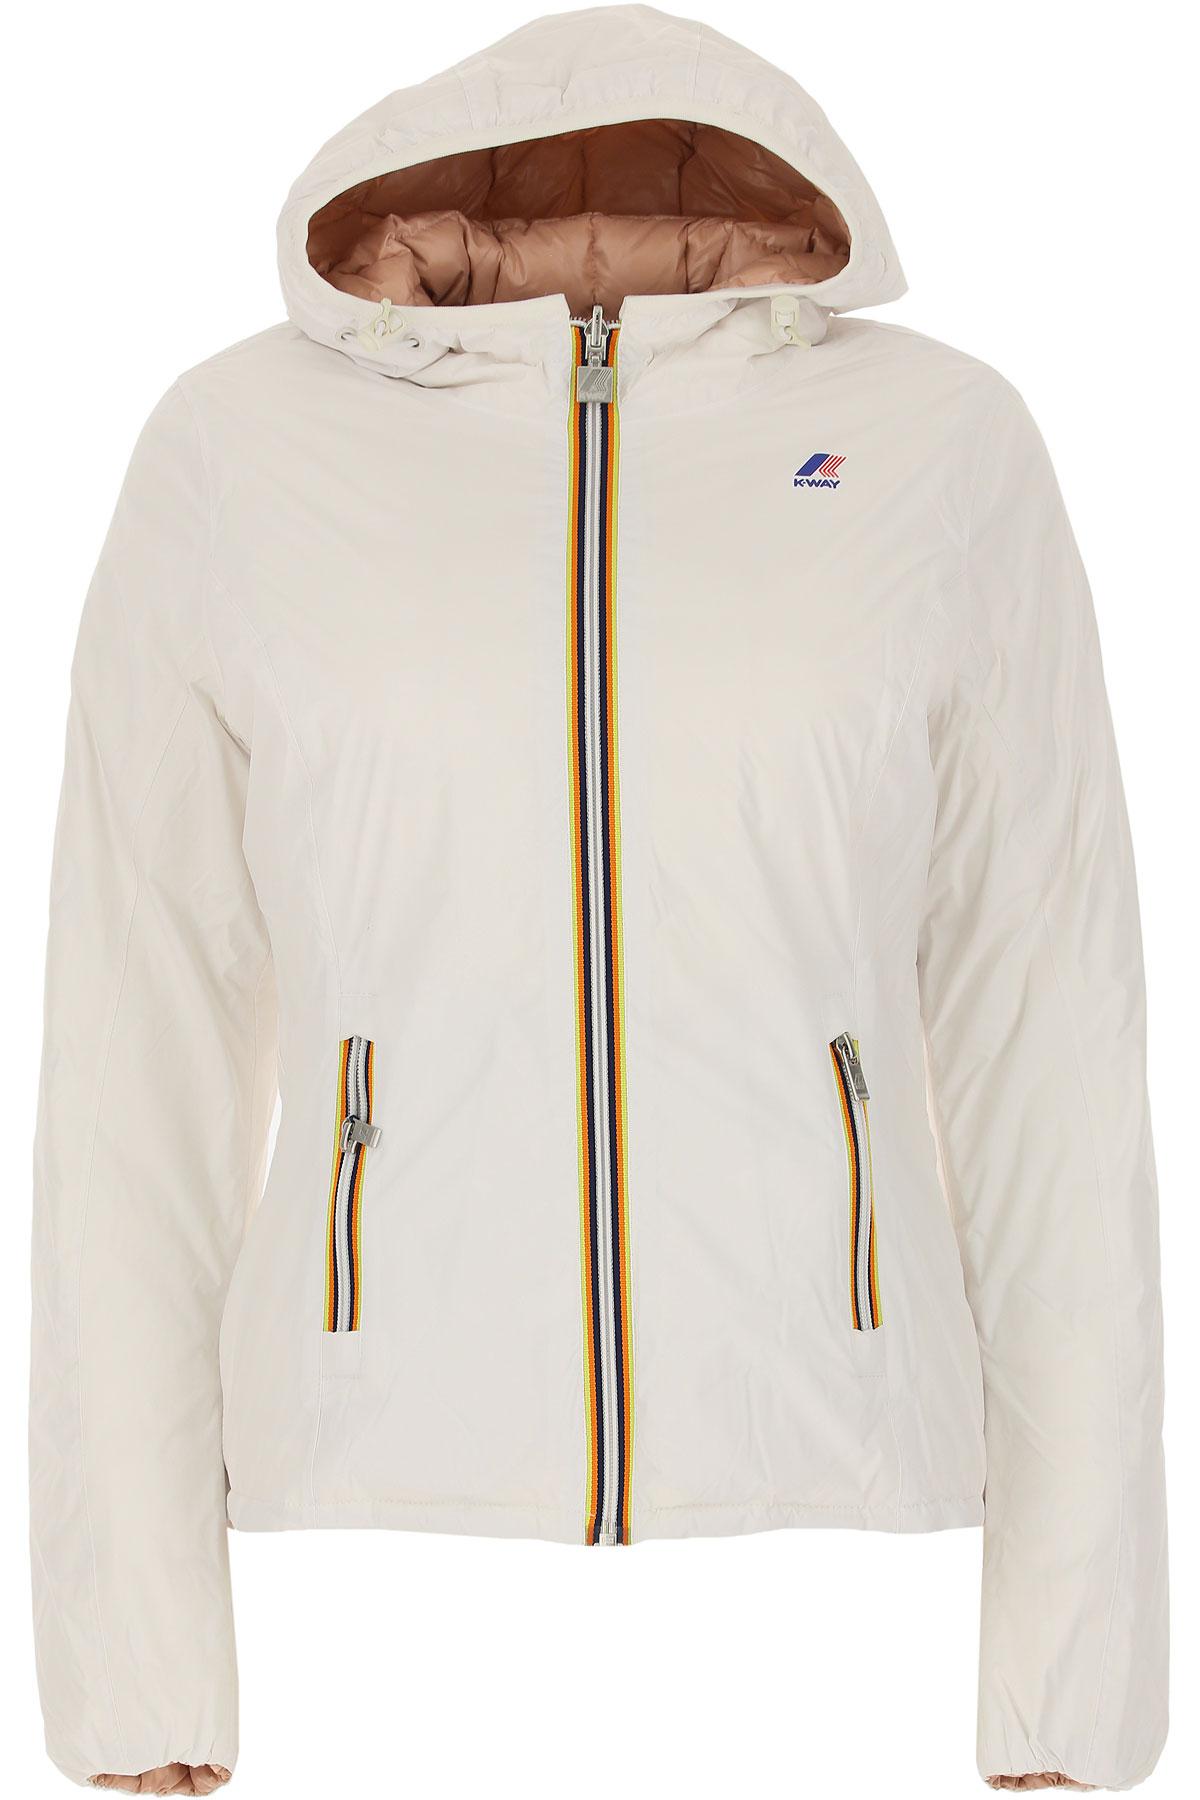 K-Way Down Jacket for Women, Puffer Ski Jacket On Sale, Reversible, White, Down, 2019, 40 44 46